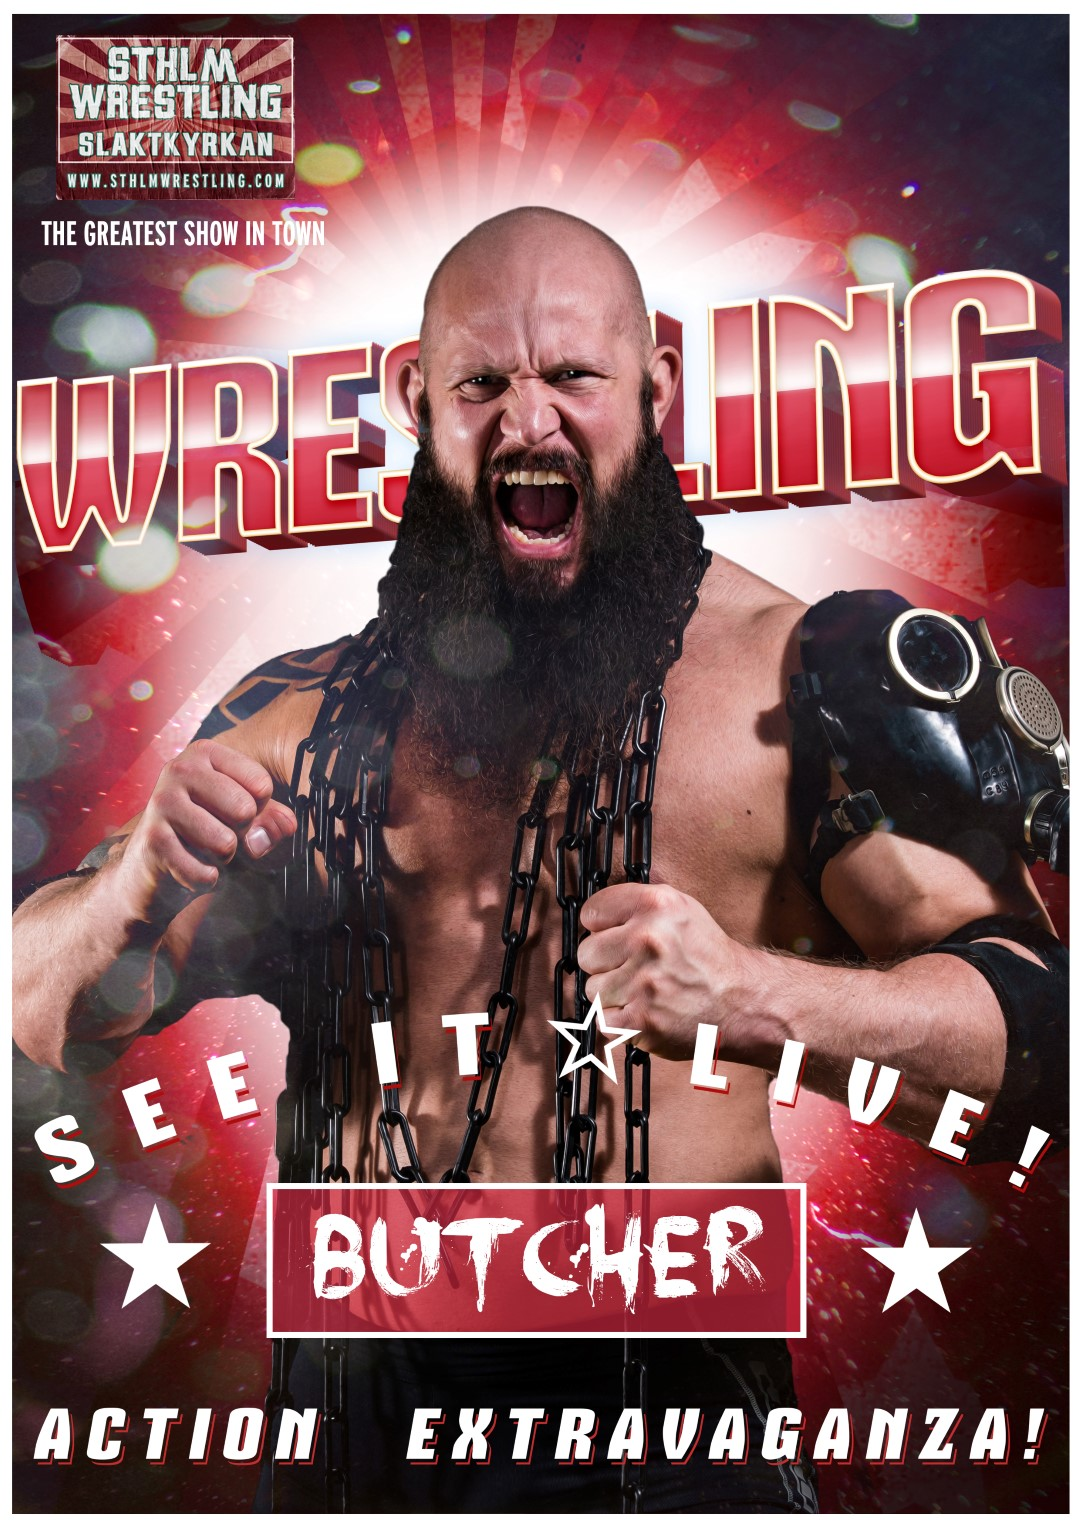 Butcher!